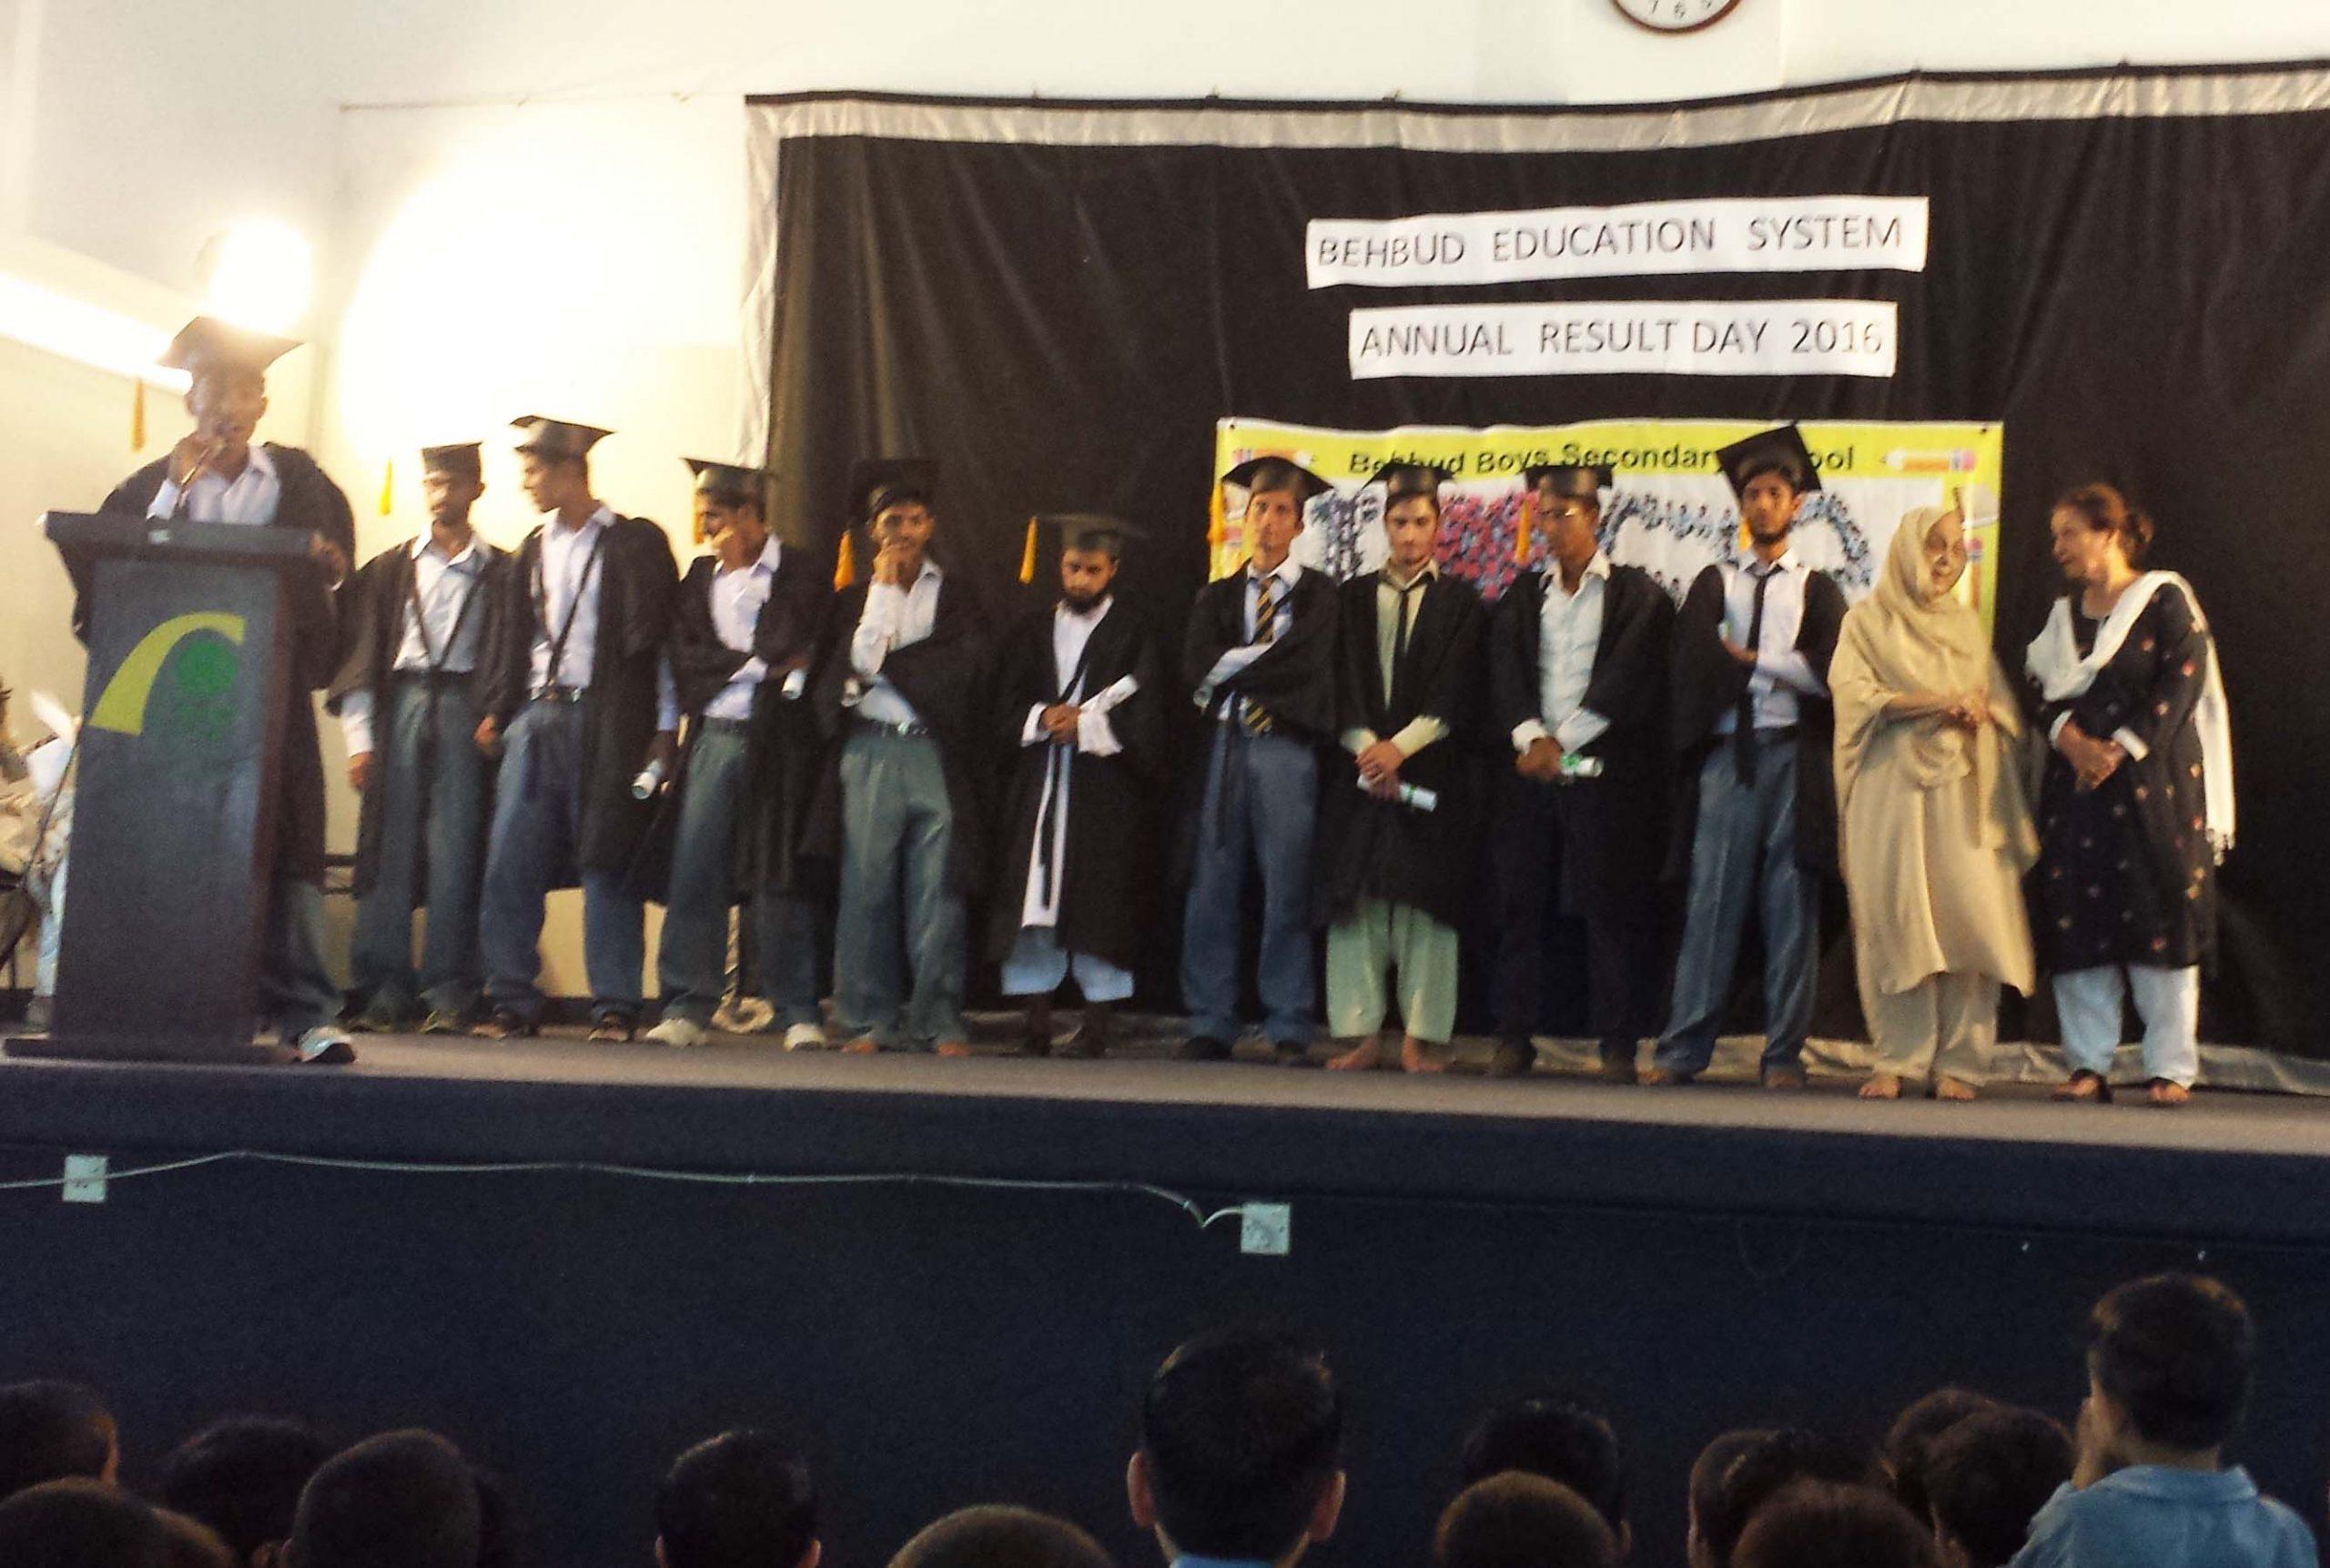 Behbud Boys Secondary School Annual Result Day-2